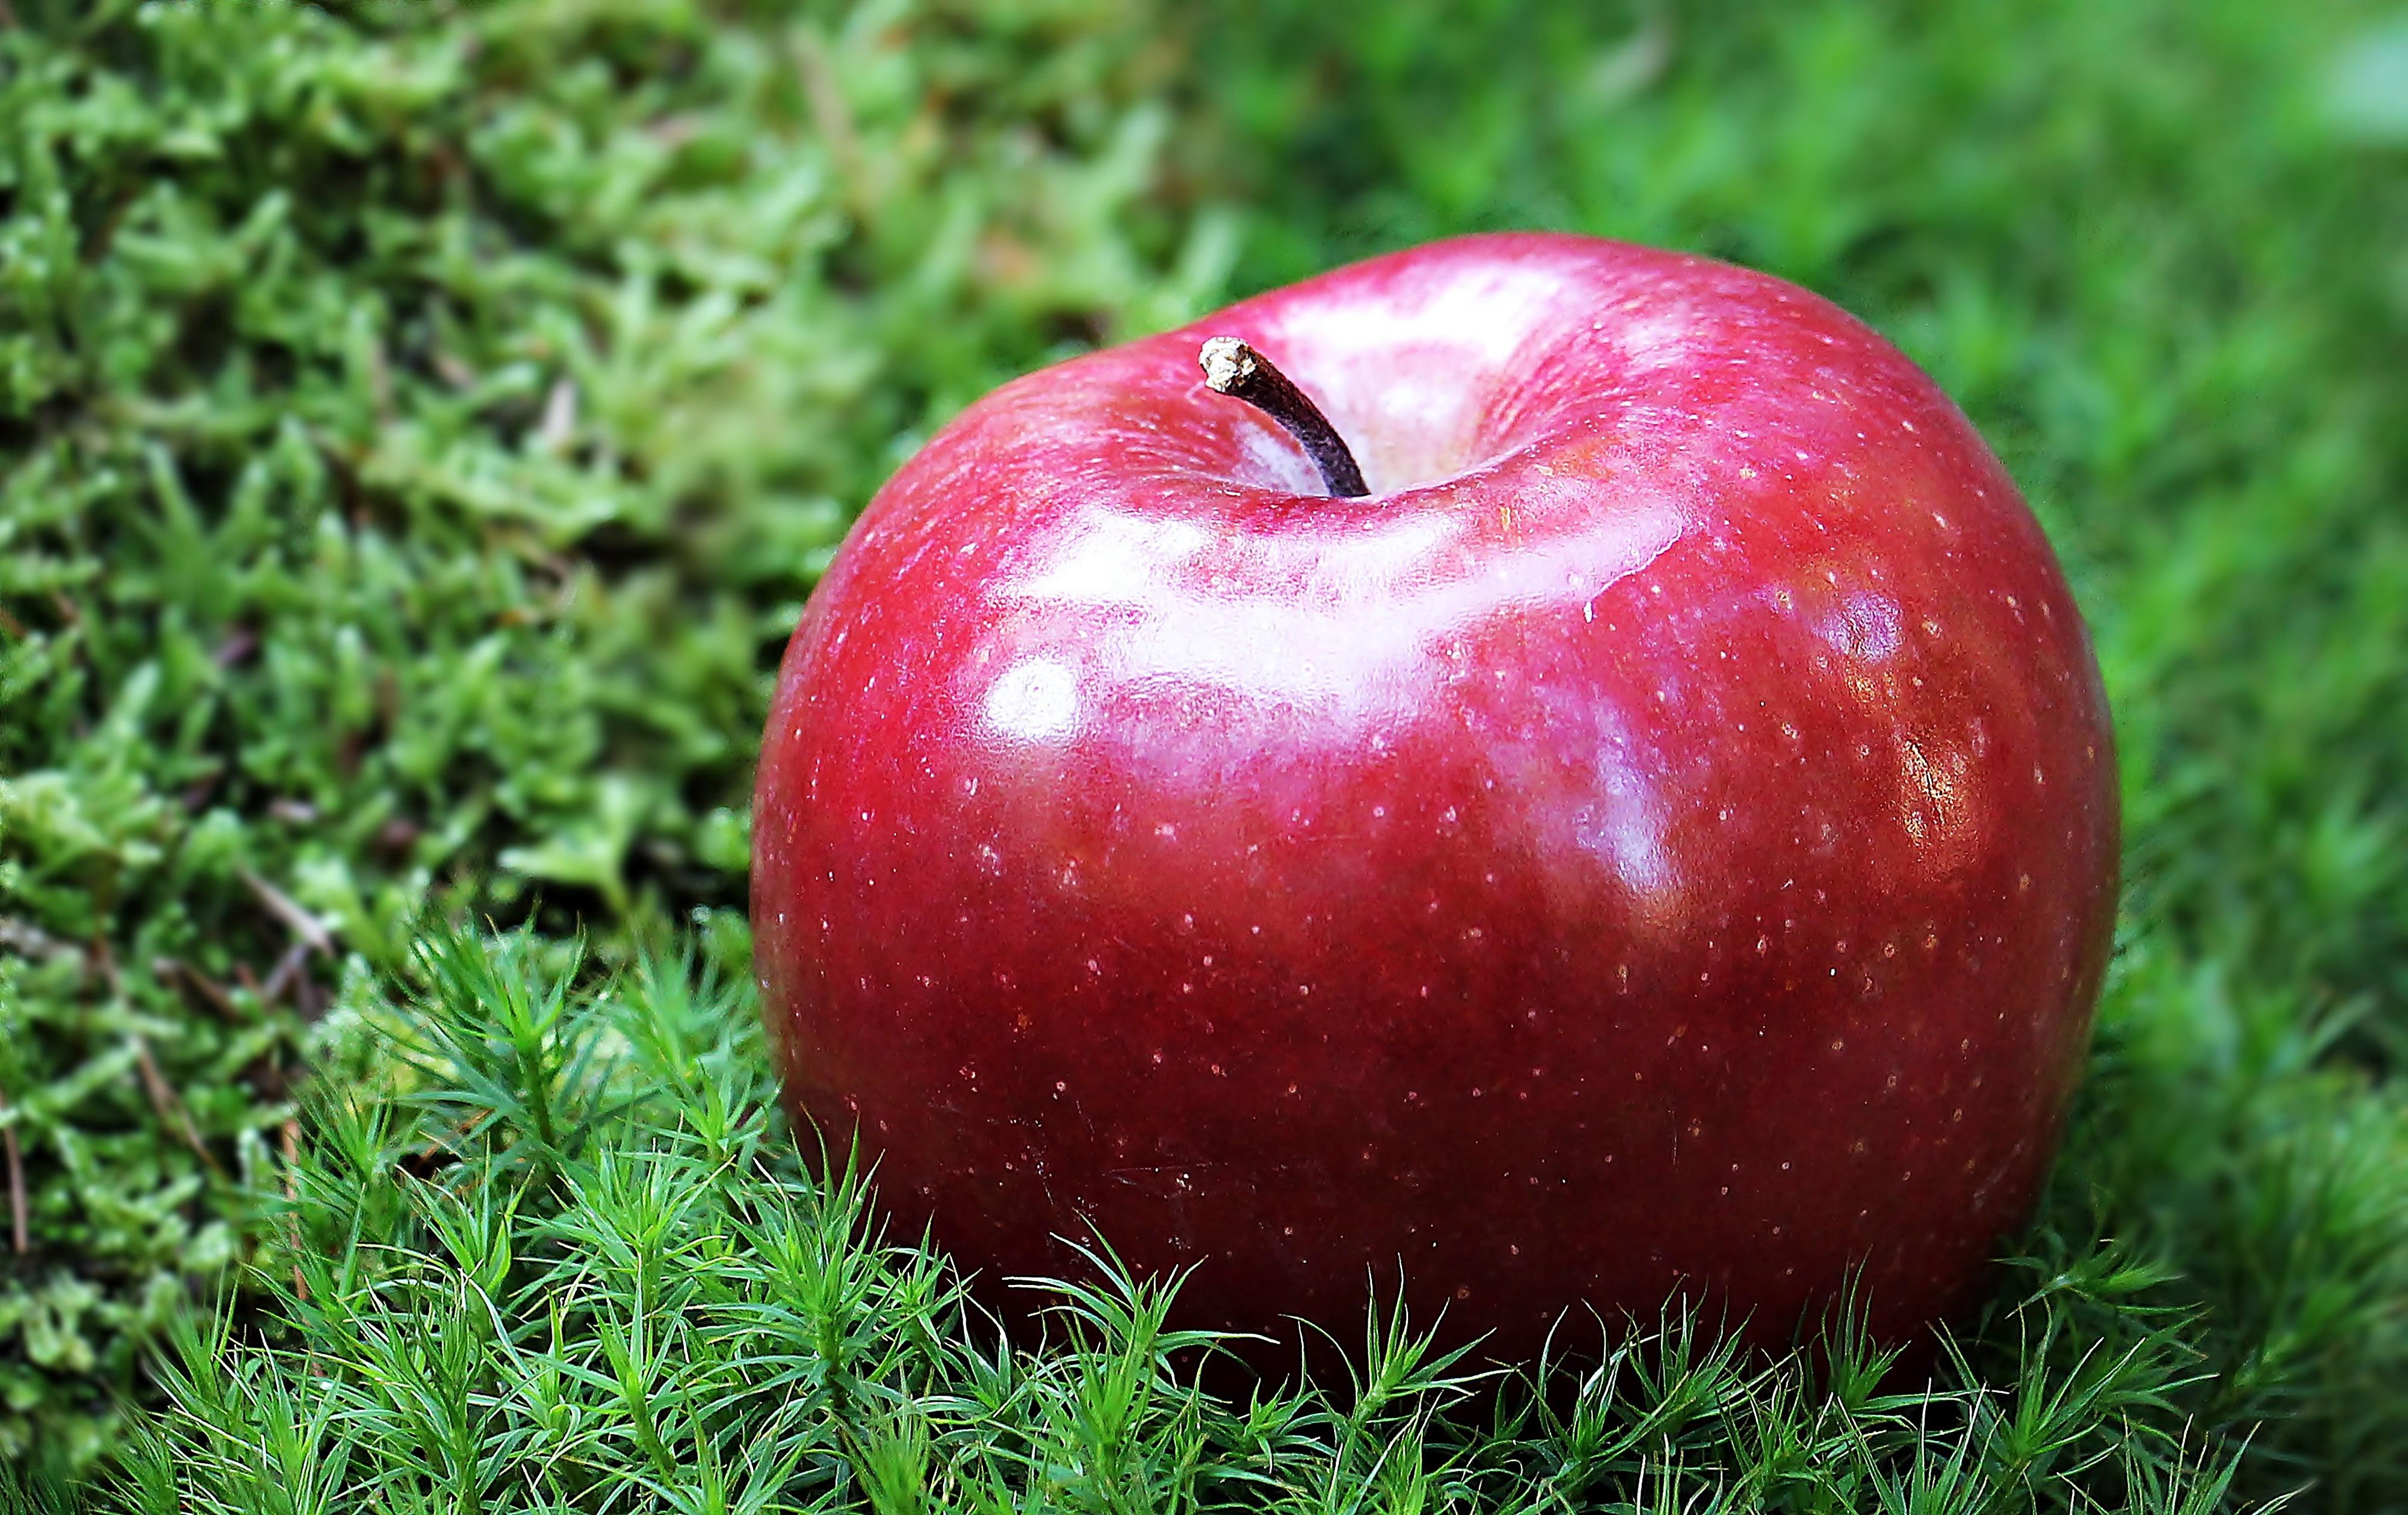 apple fruit background grass - photo #20